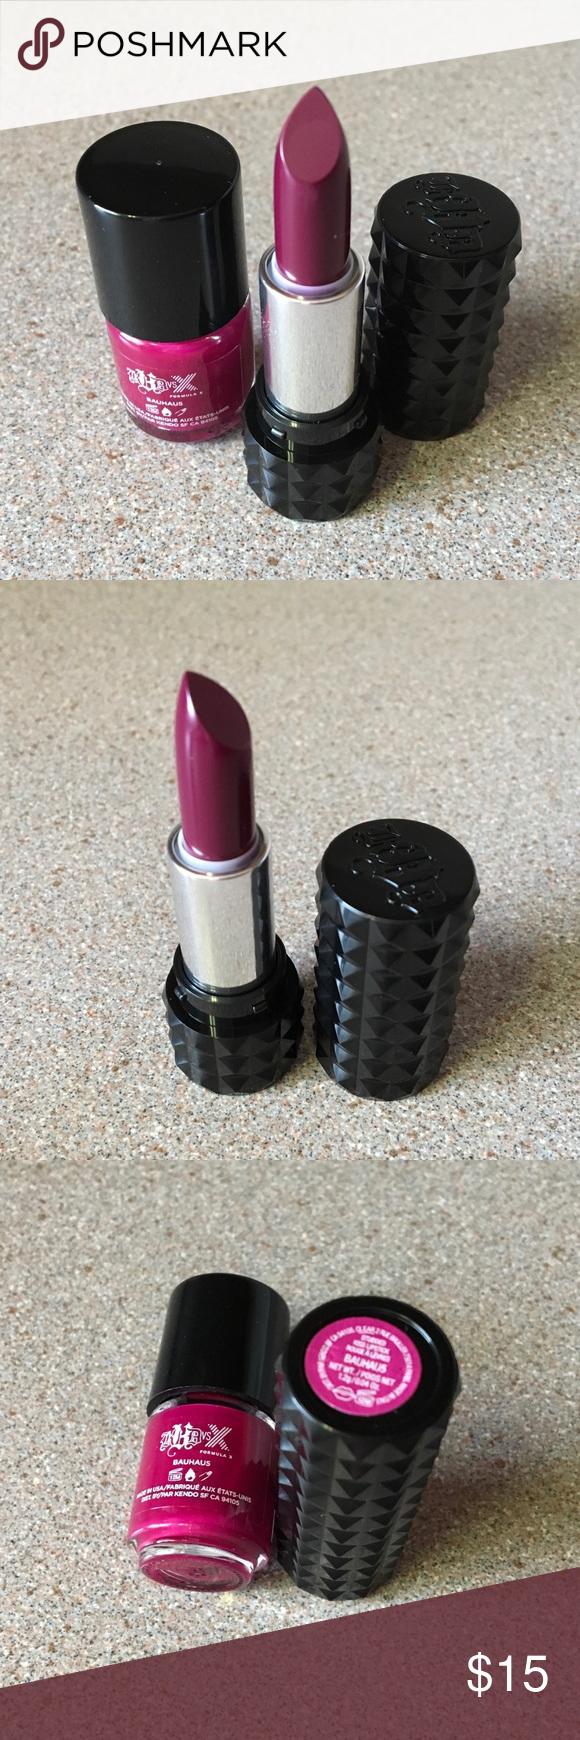 Kat Von D Bauhau5 Lipstick & Polish Set. NEW! Kat Von D Bauhau5 ...